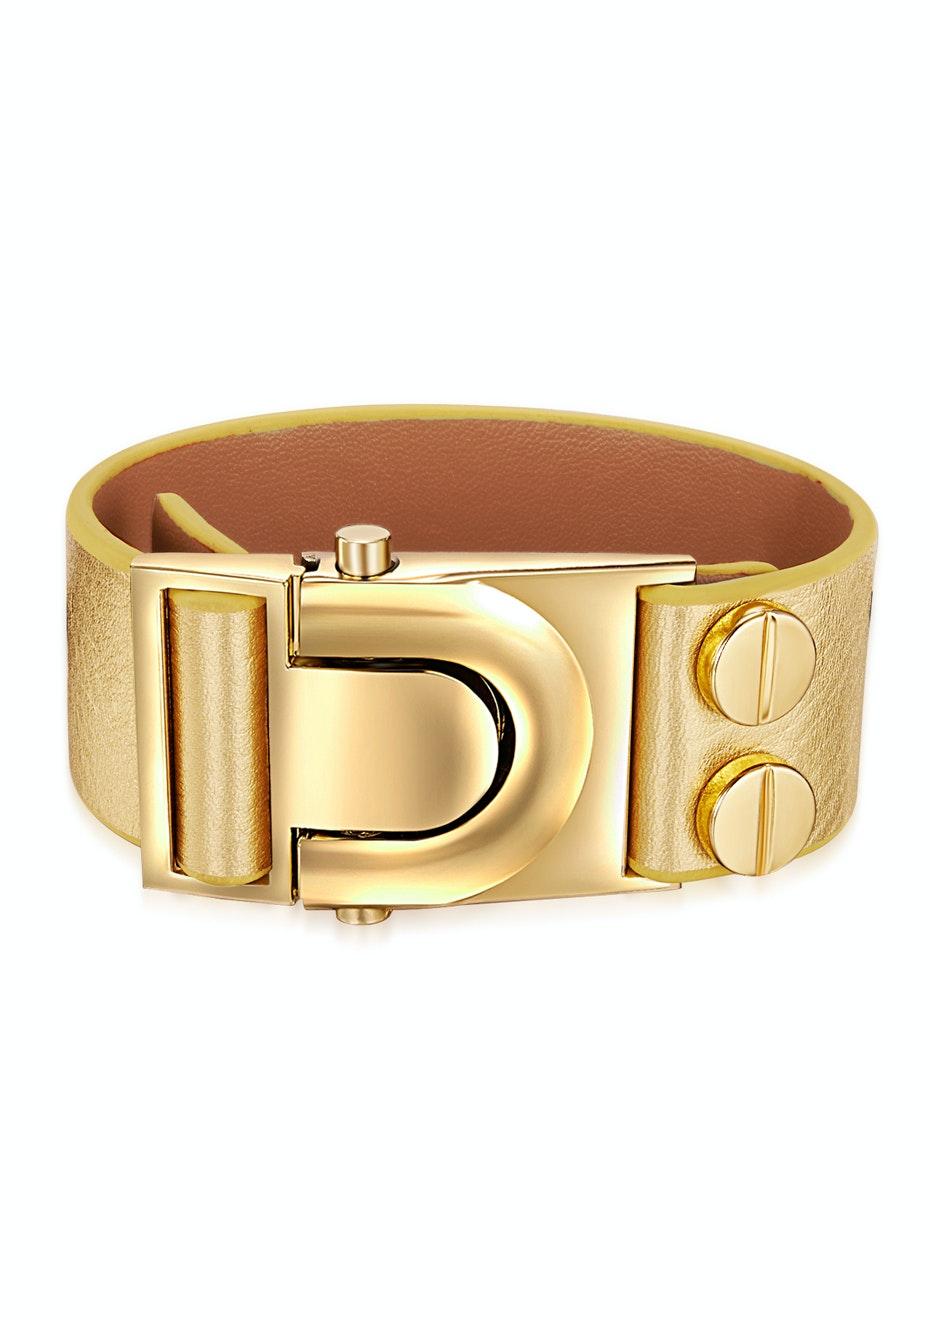 Genuine Cow Leather Clasp Bracelet - GLD